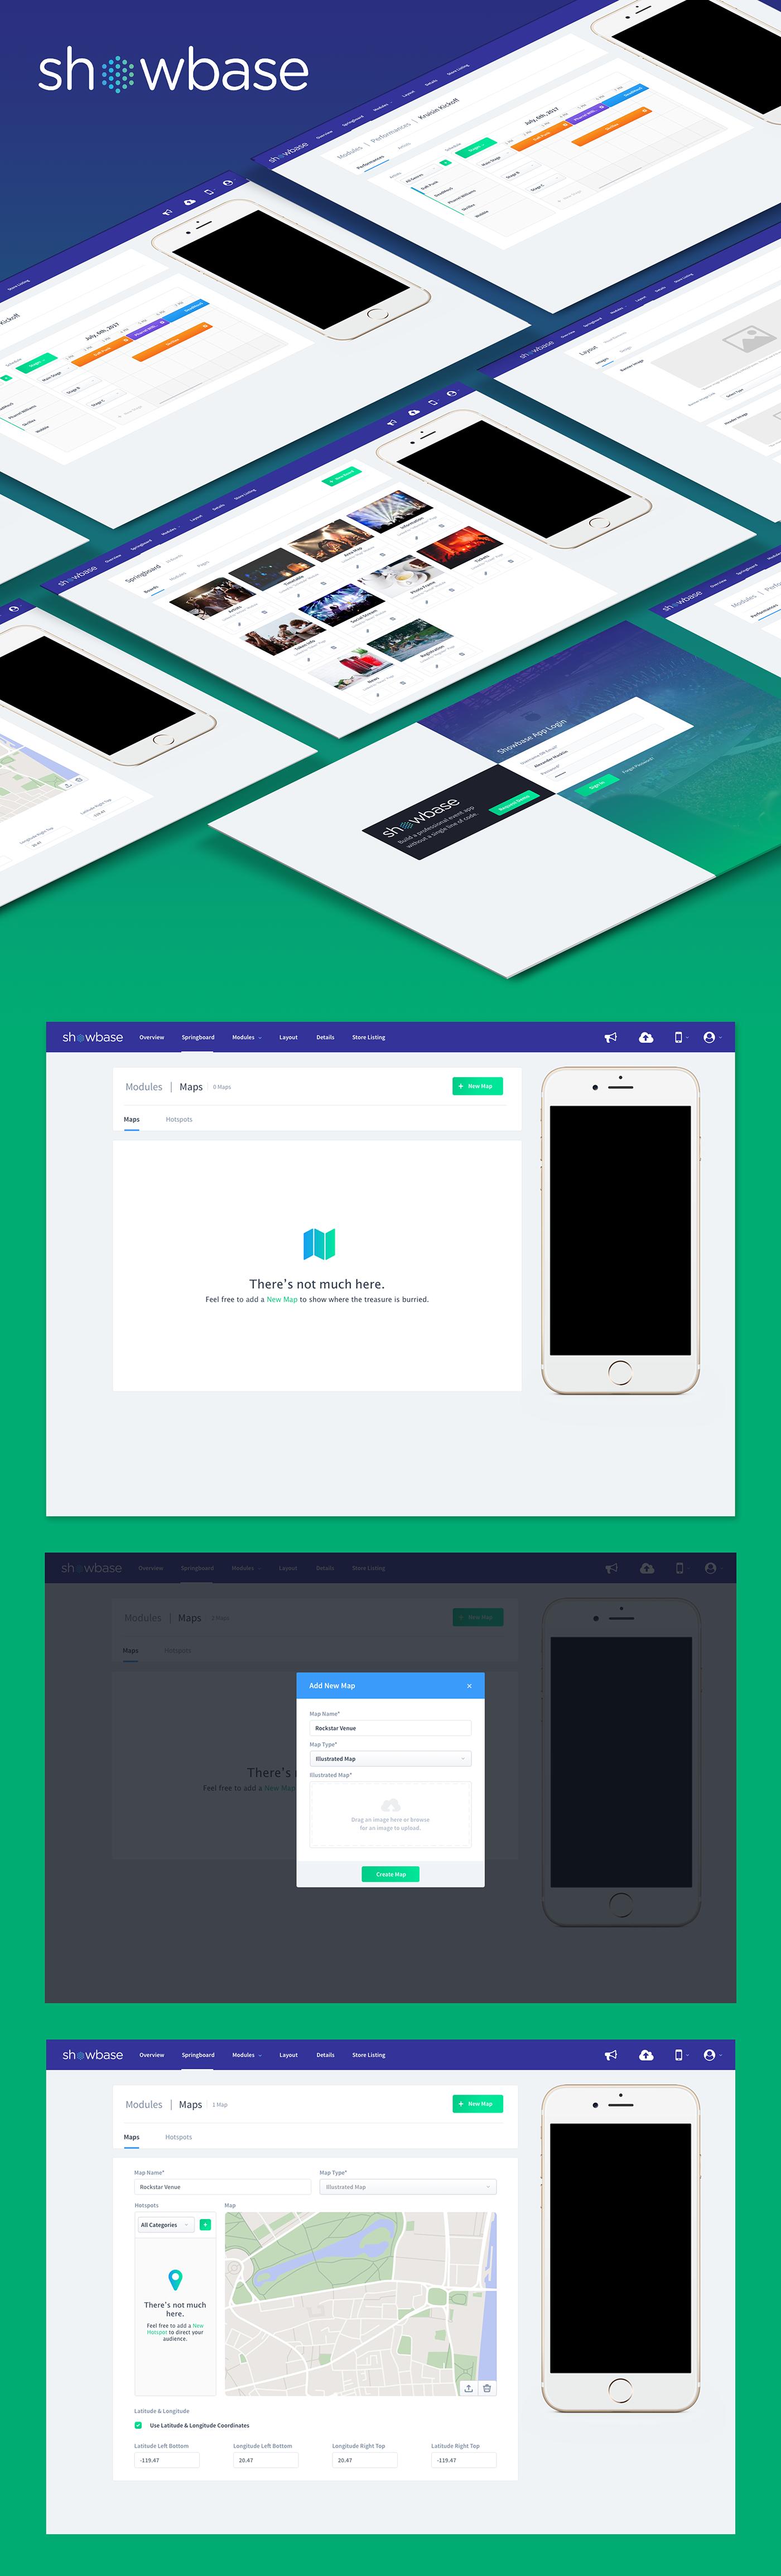 Event webapp ux UI showbase sketch sketchapp Illustrator user interface user experience